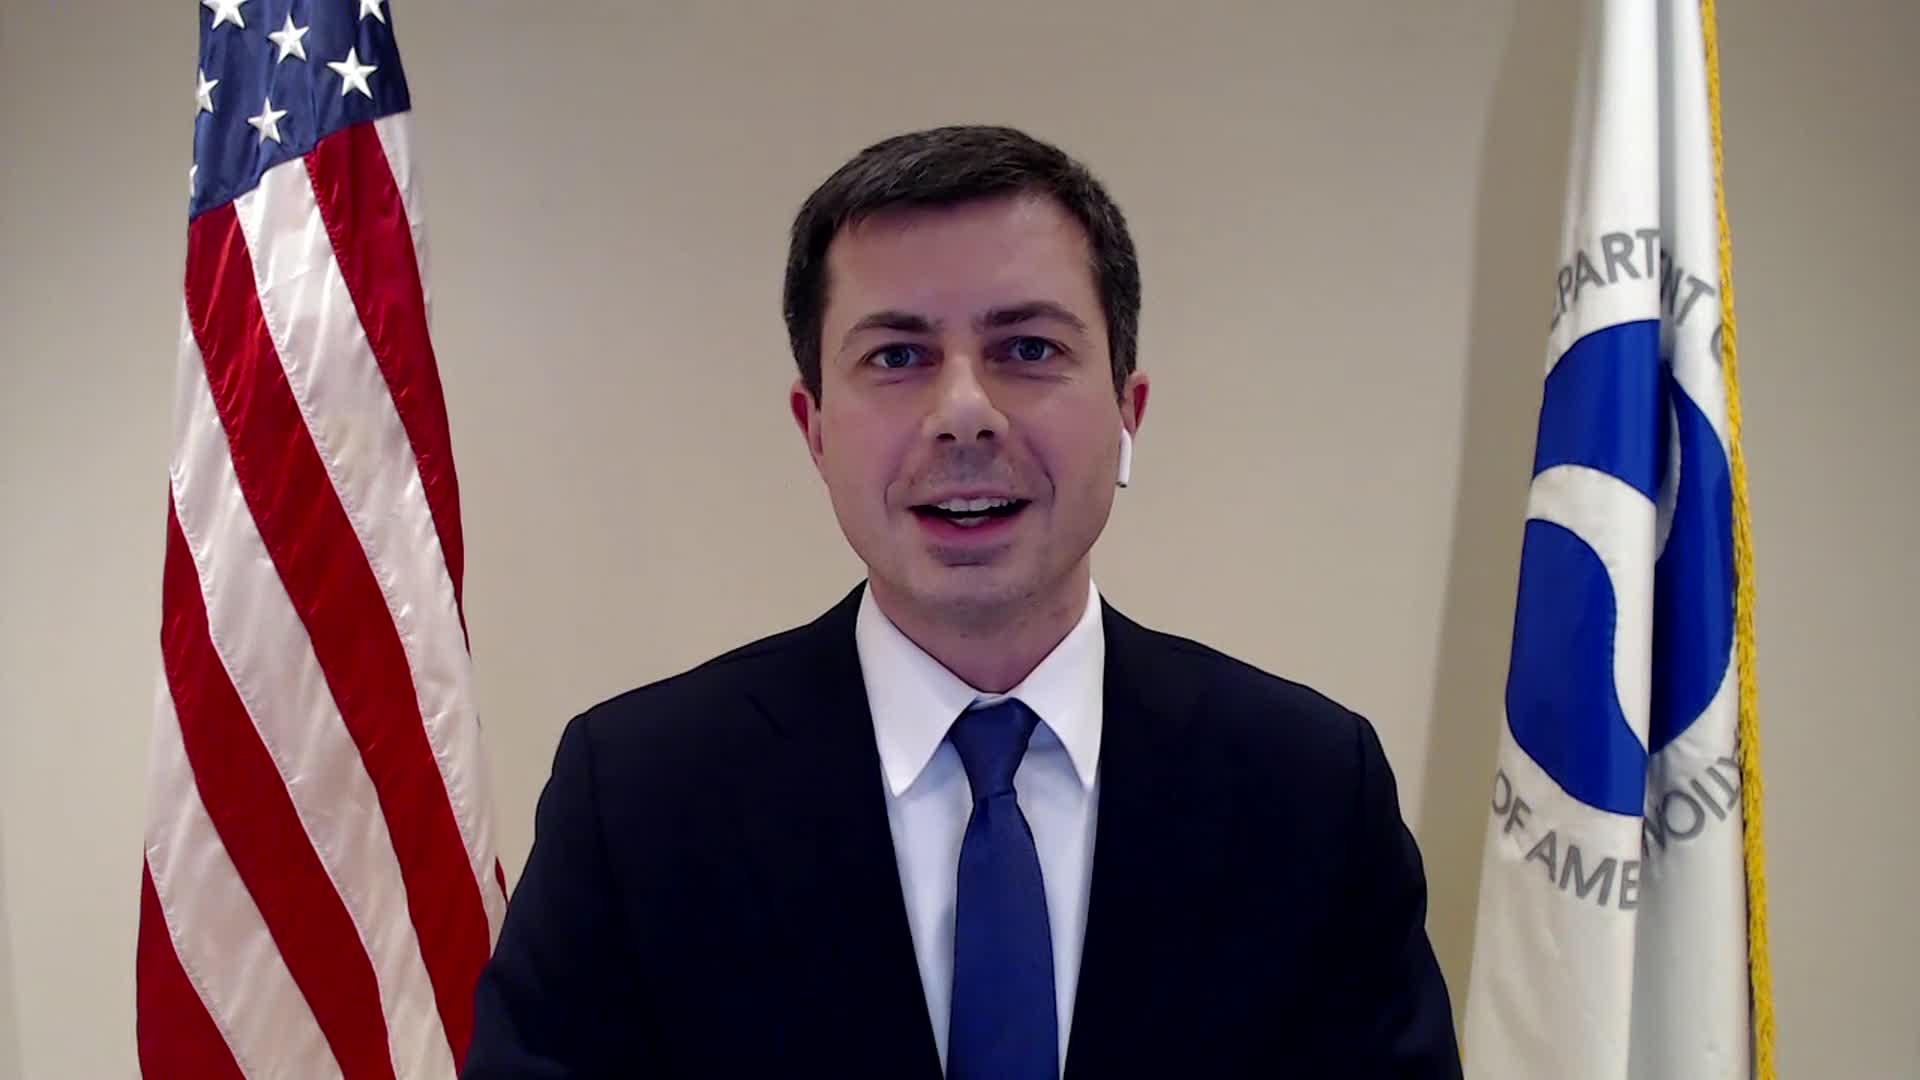 Transportation Secretary PeteButtigieg.